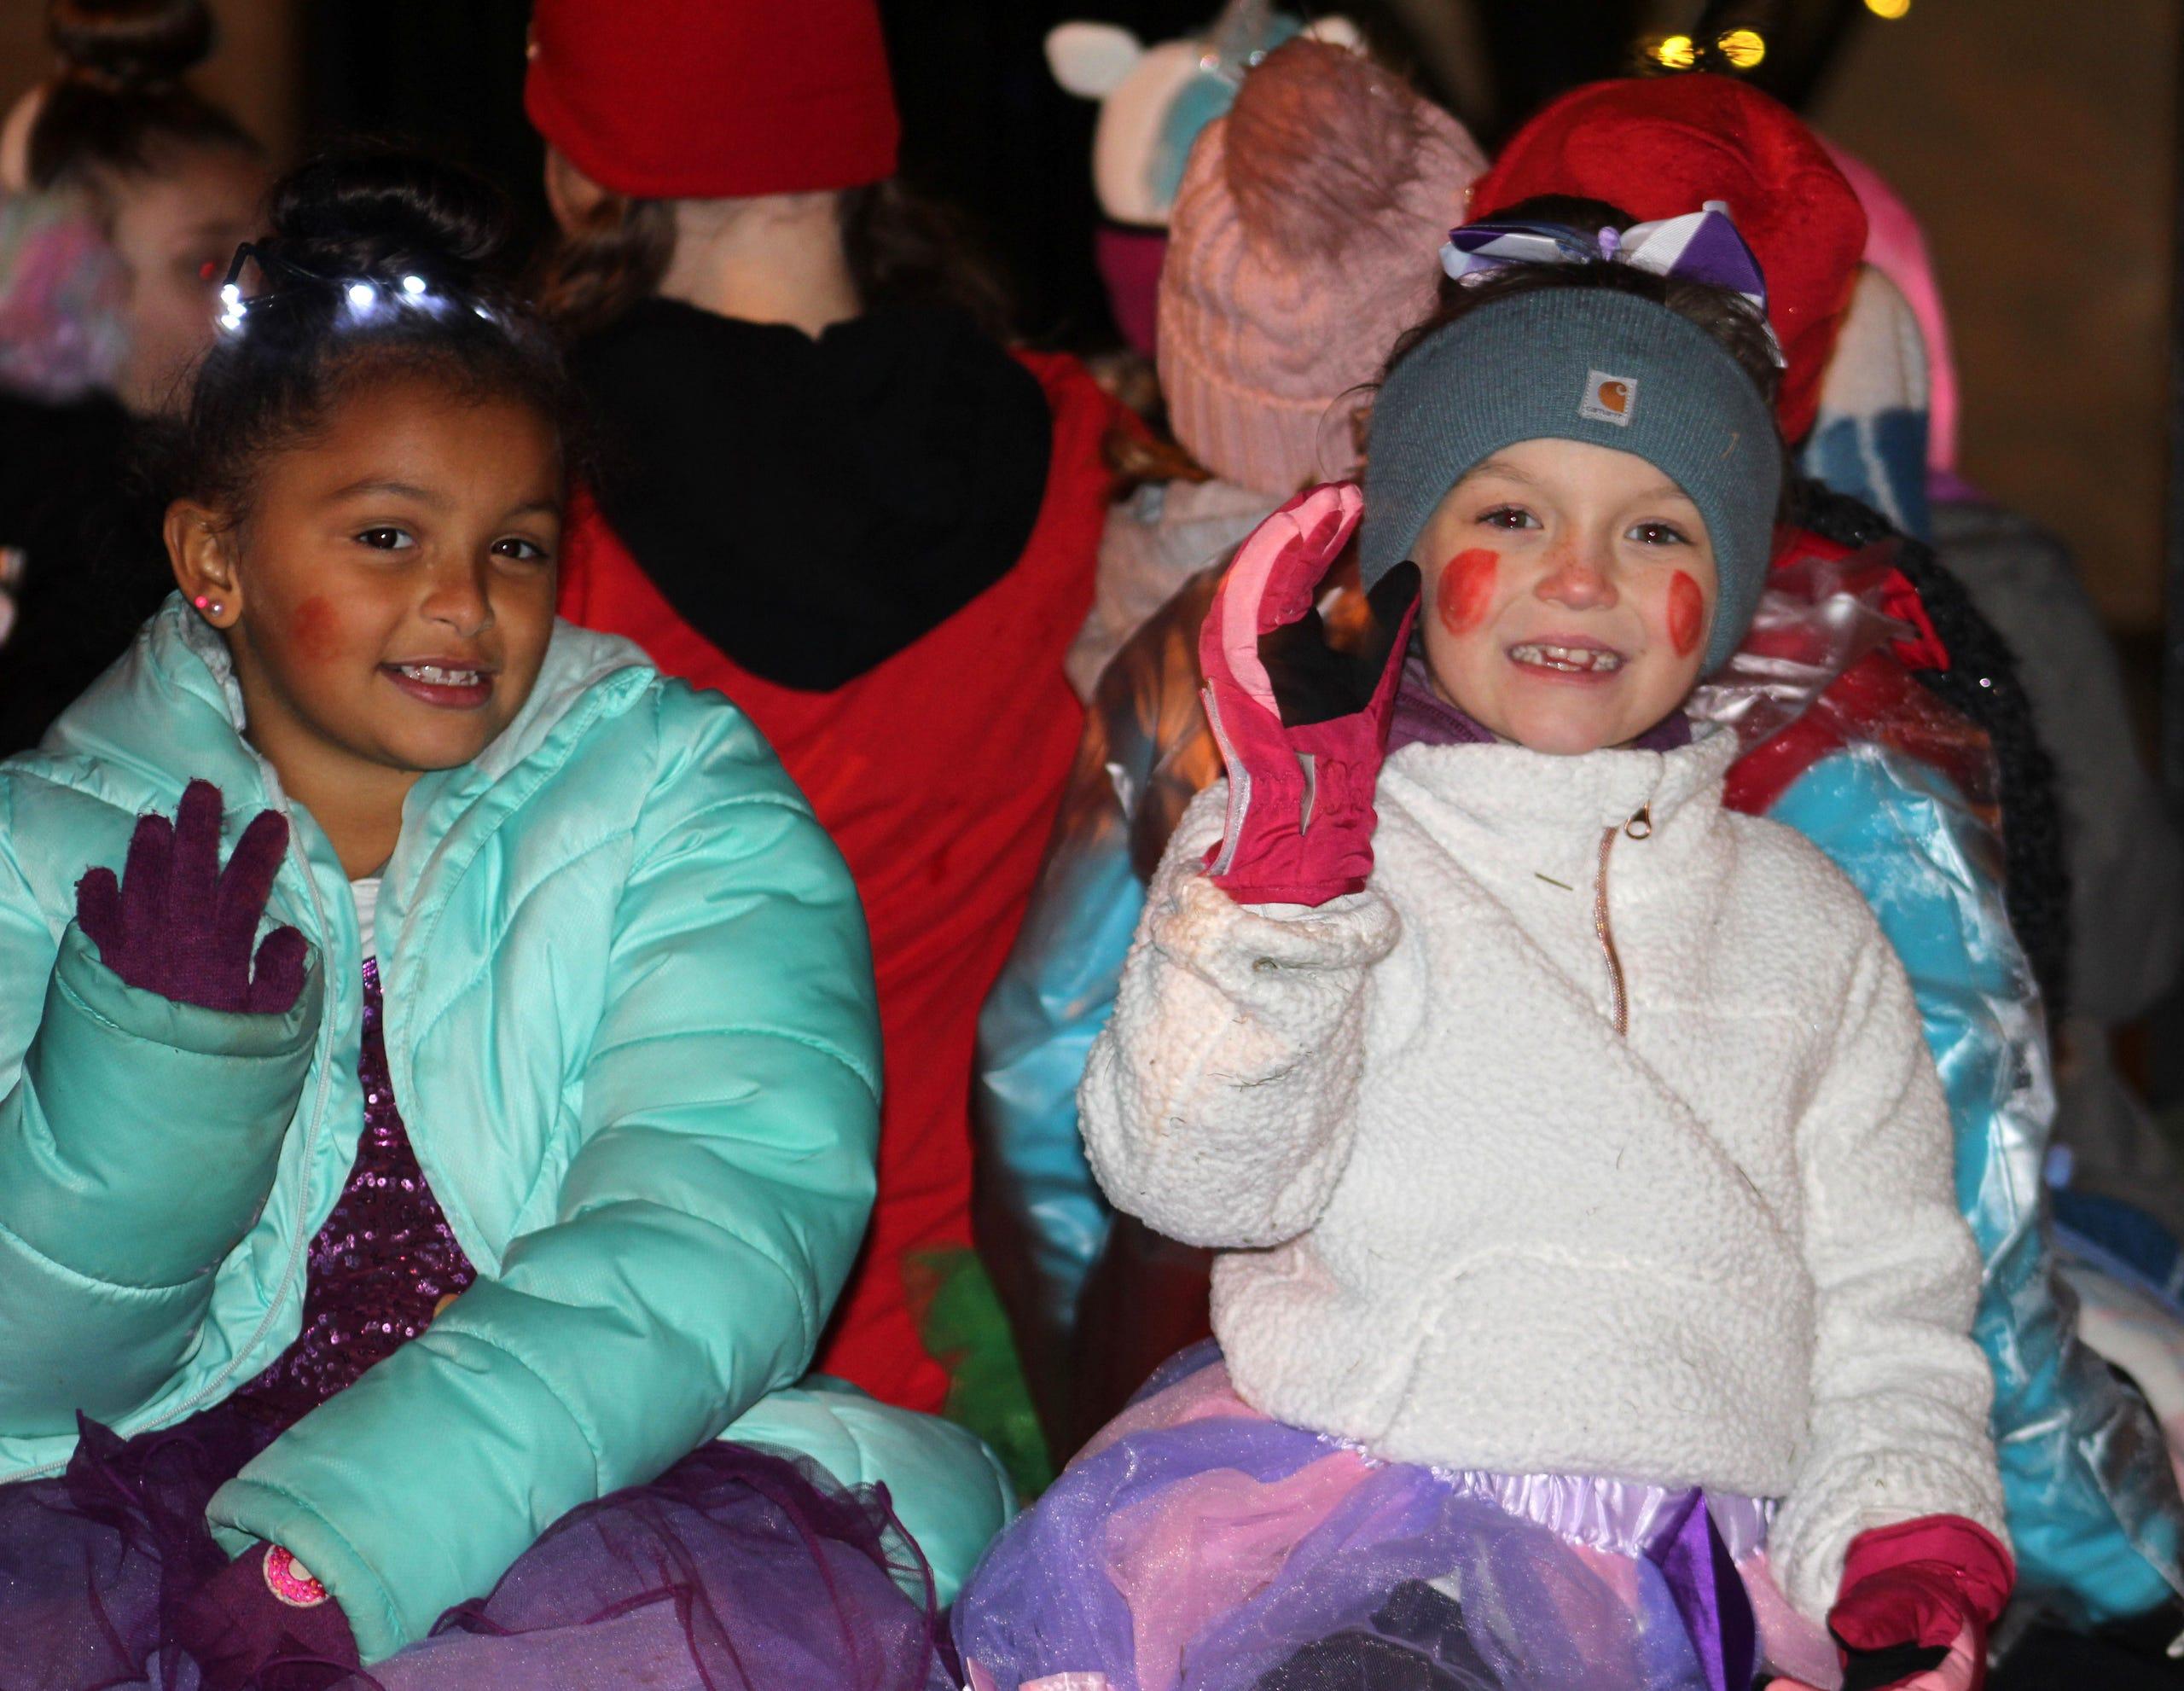 Chambersburg Christmas Parade 2020 Photos: Chambersburg, Pa., Christmas parade